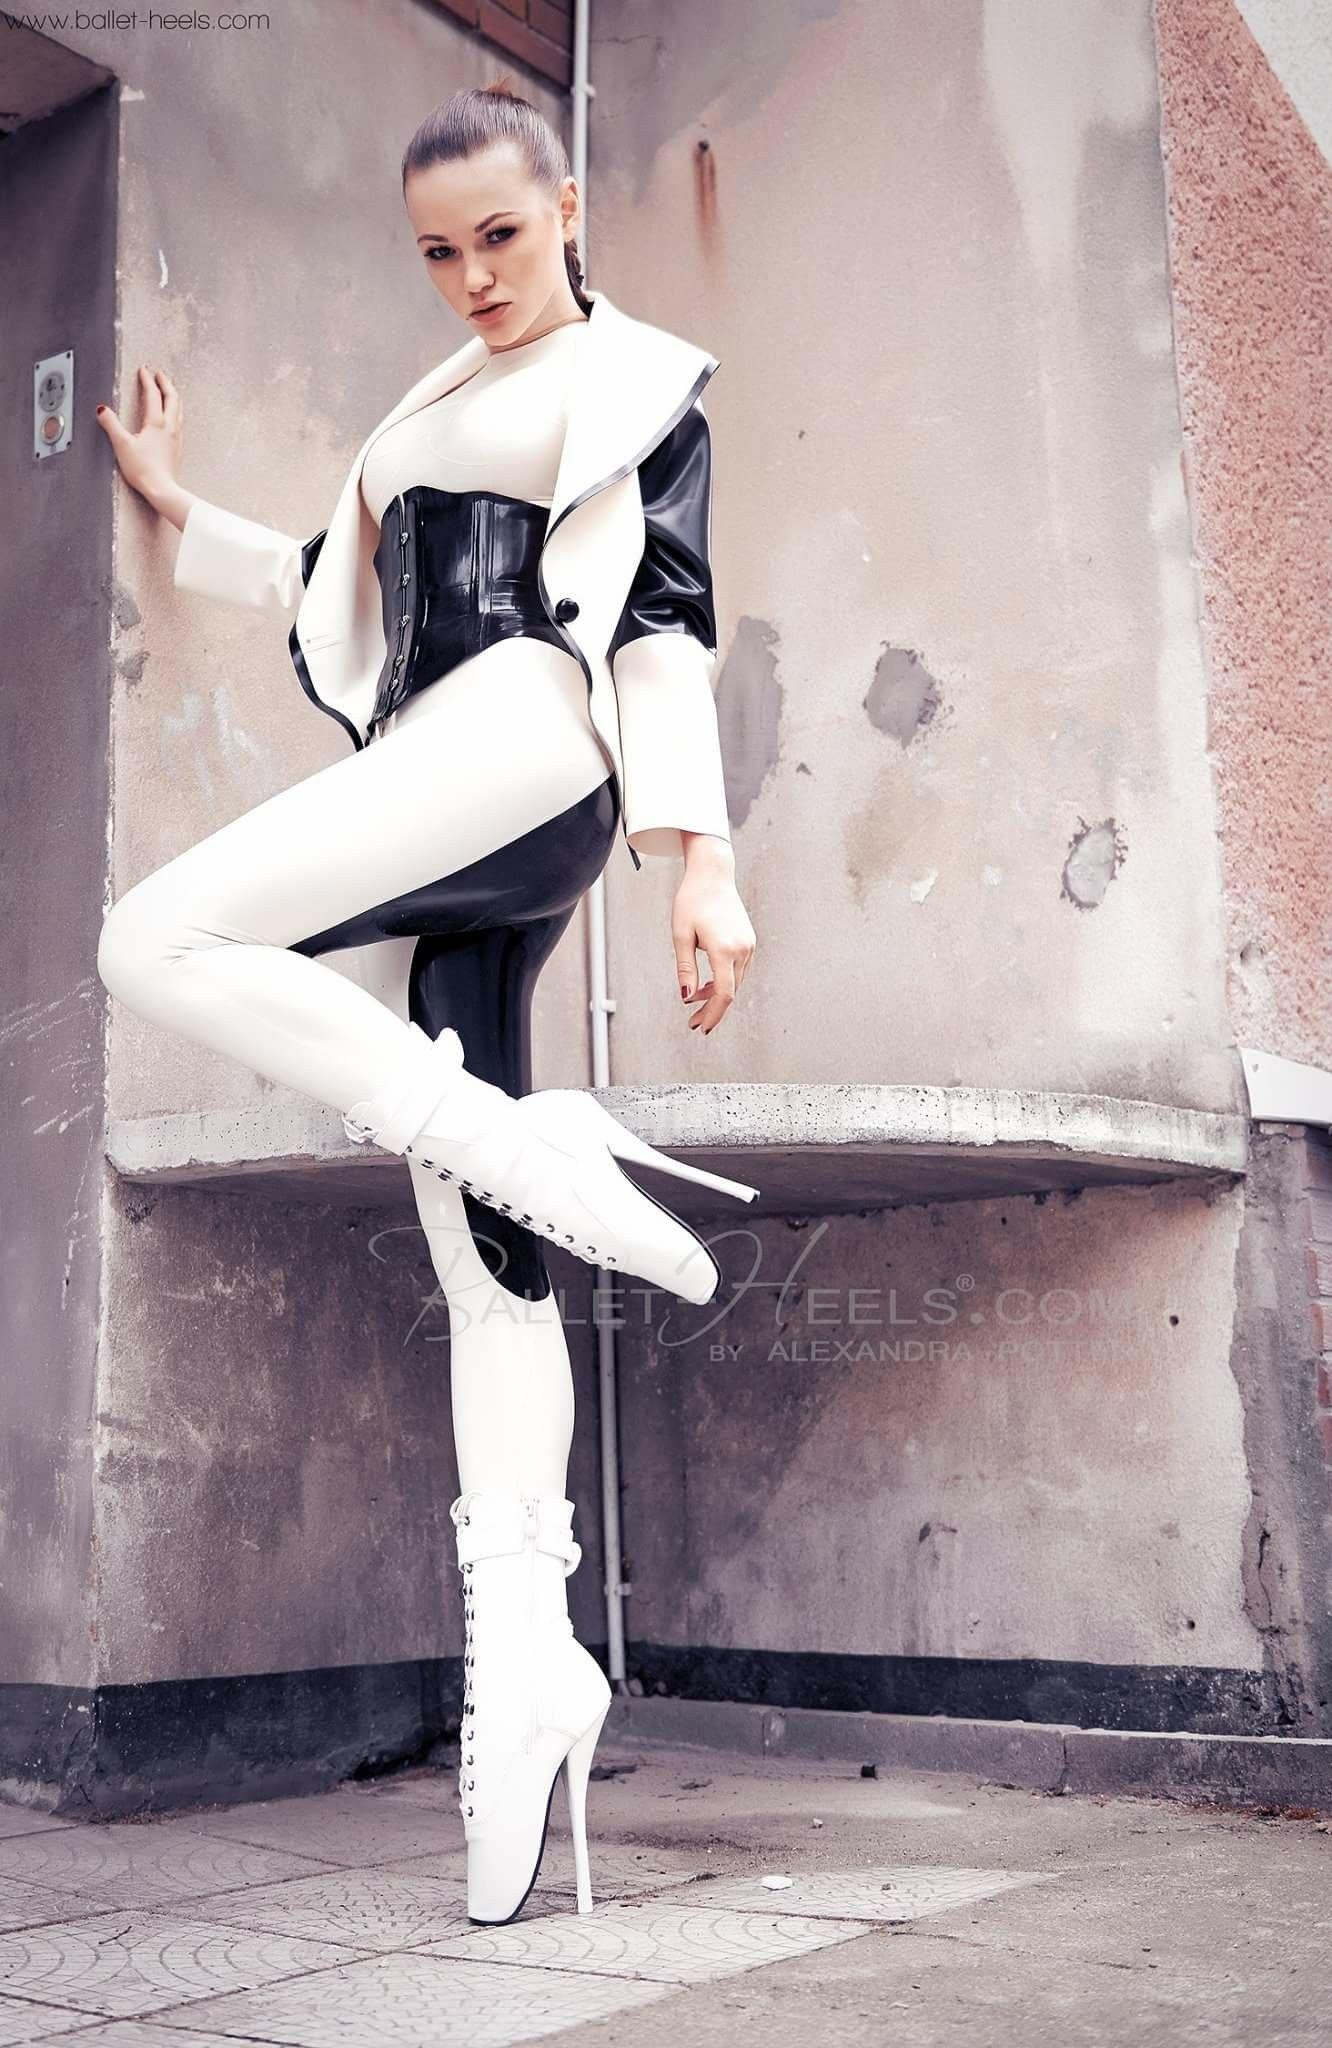 81a028f061b5 Alexandra Potter | Sexy dresses | Lack und leder, Leder und Latex